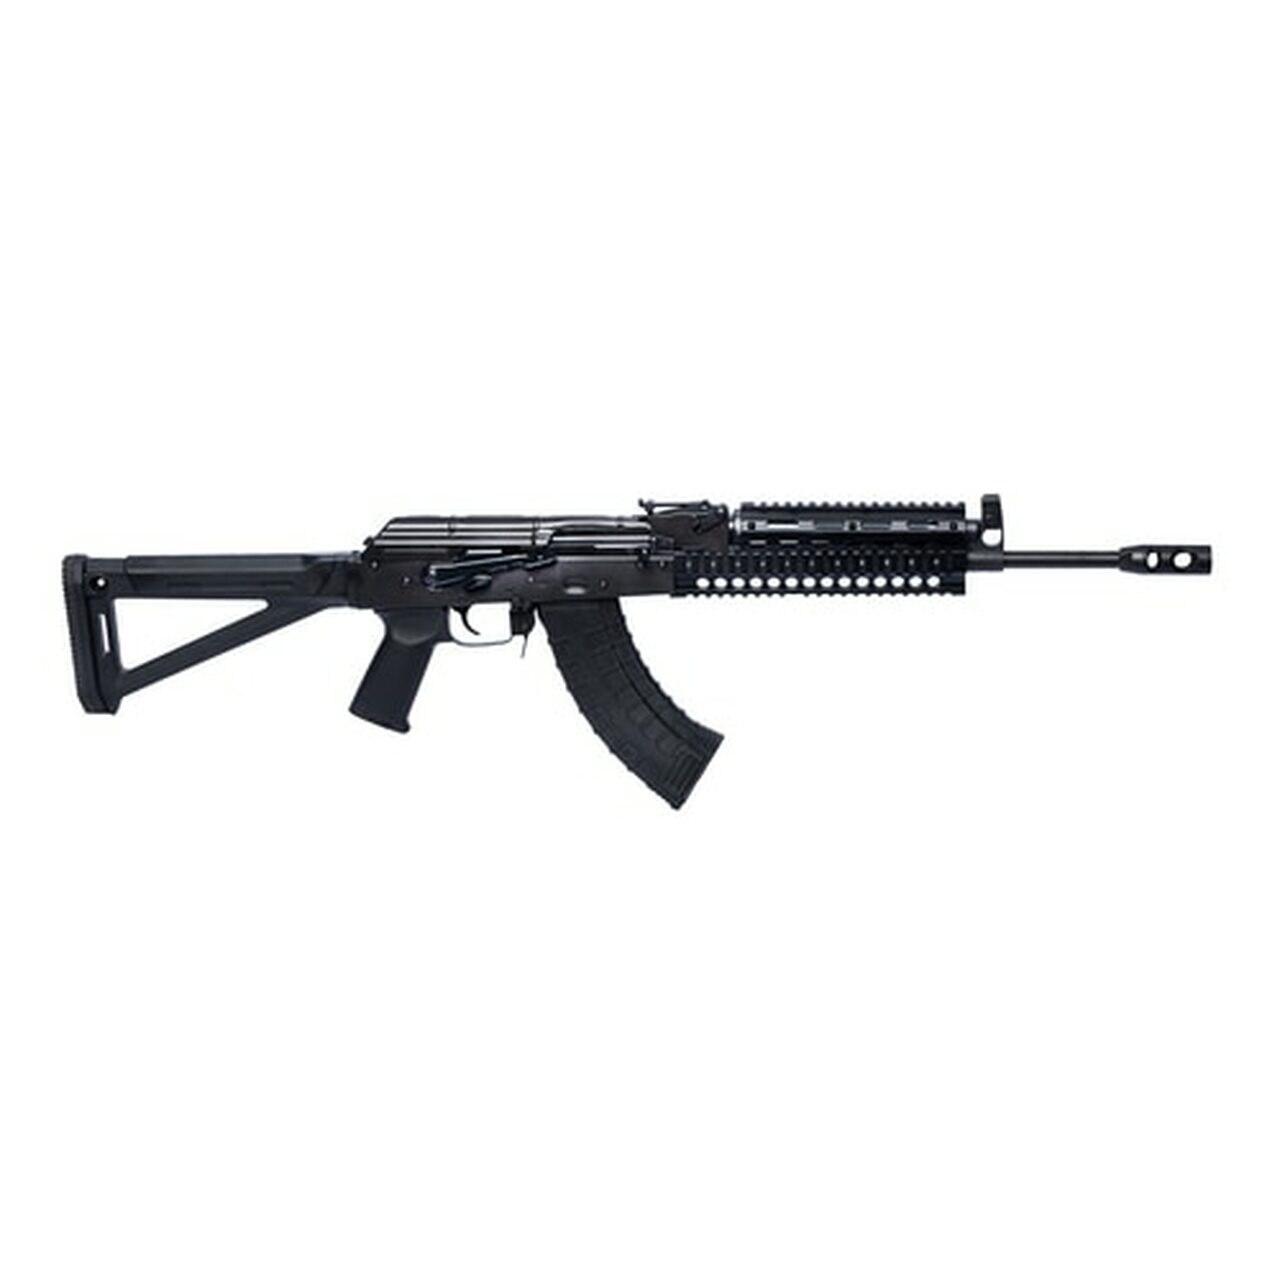 "Image of Riley Defense AK47 Tactical Magpul 7.62x39mm, 16"" Barrel, Modular Rail, Black, 30rd"